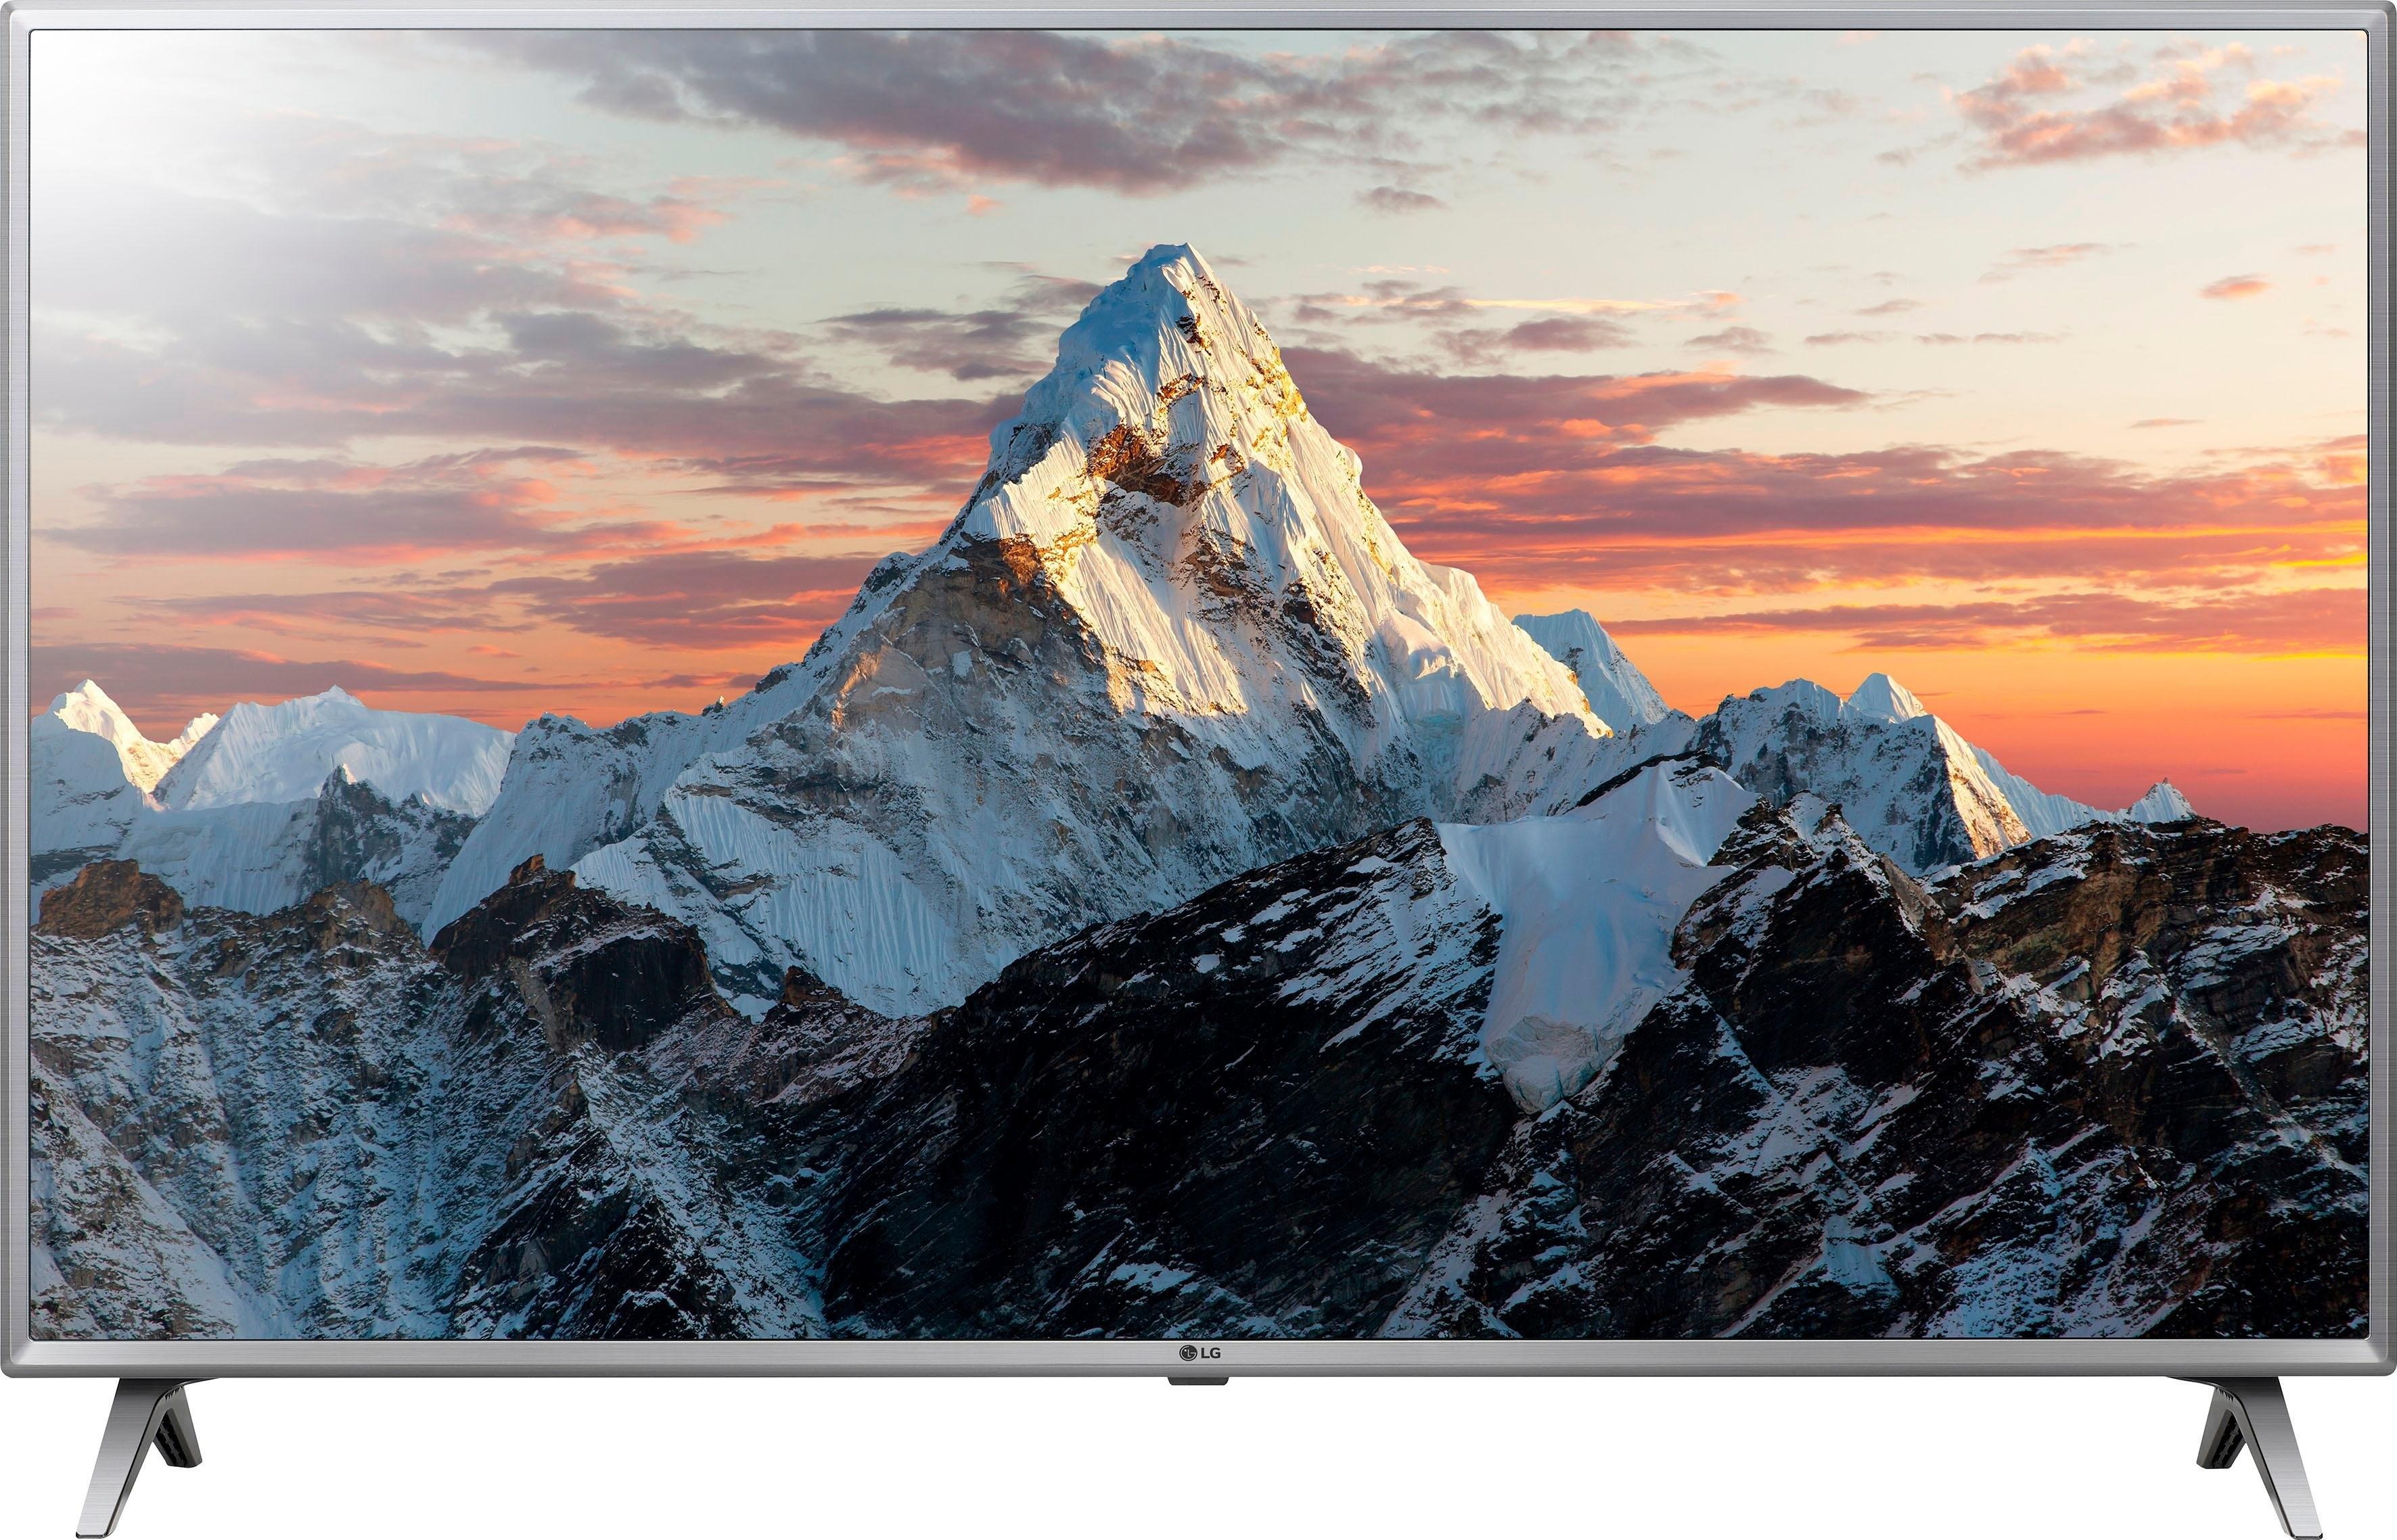 LG 43UK6500LLA led-tv (108 cm / (43 inch), 4K Ultra HD, smart-tv - gratis ruilen op otto.nl